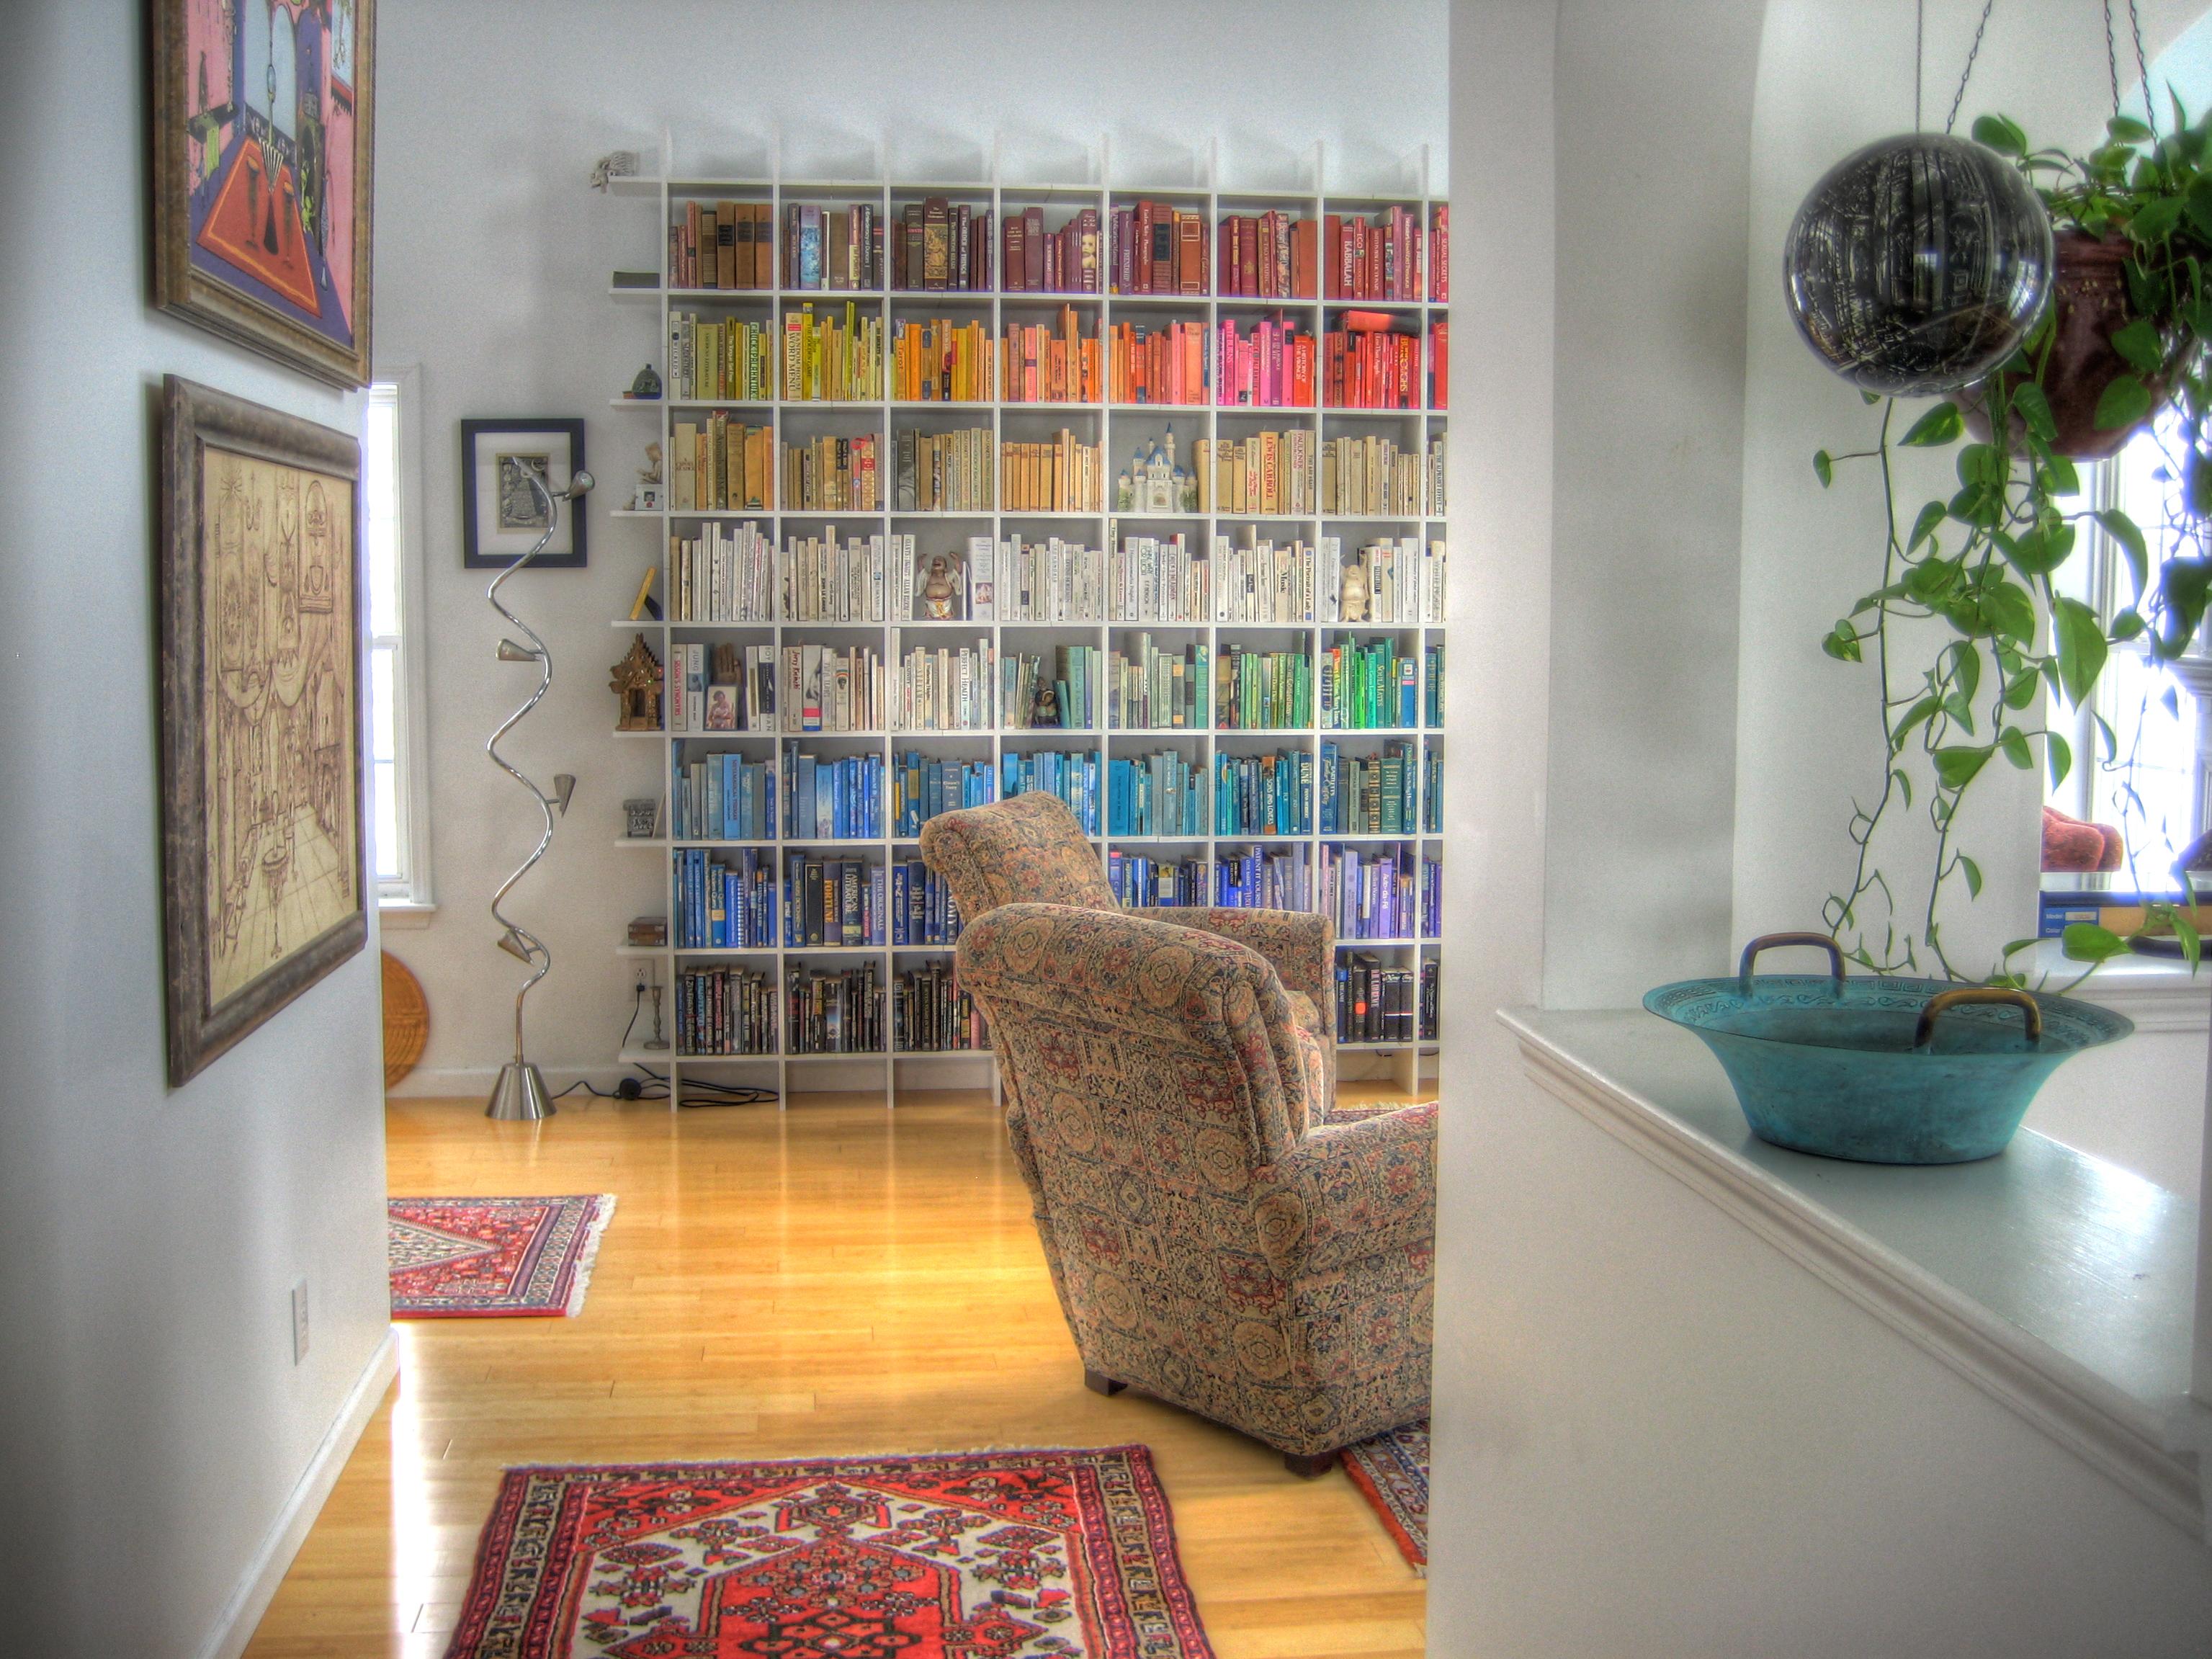 Image of rainbow shelves